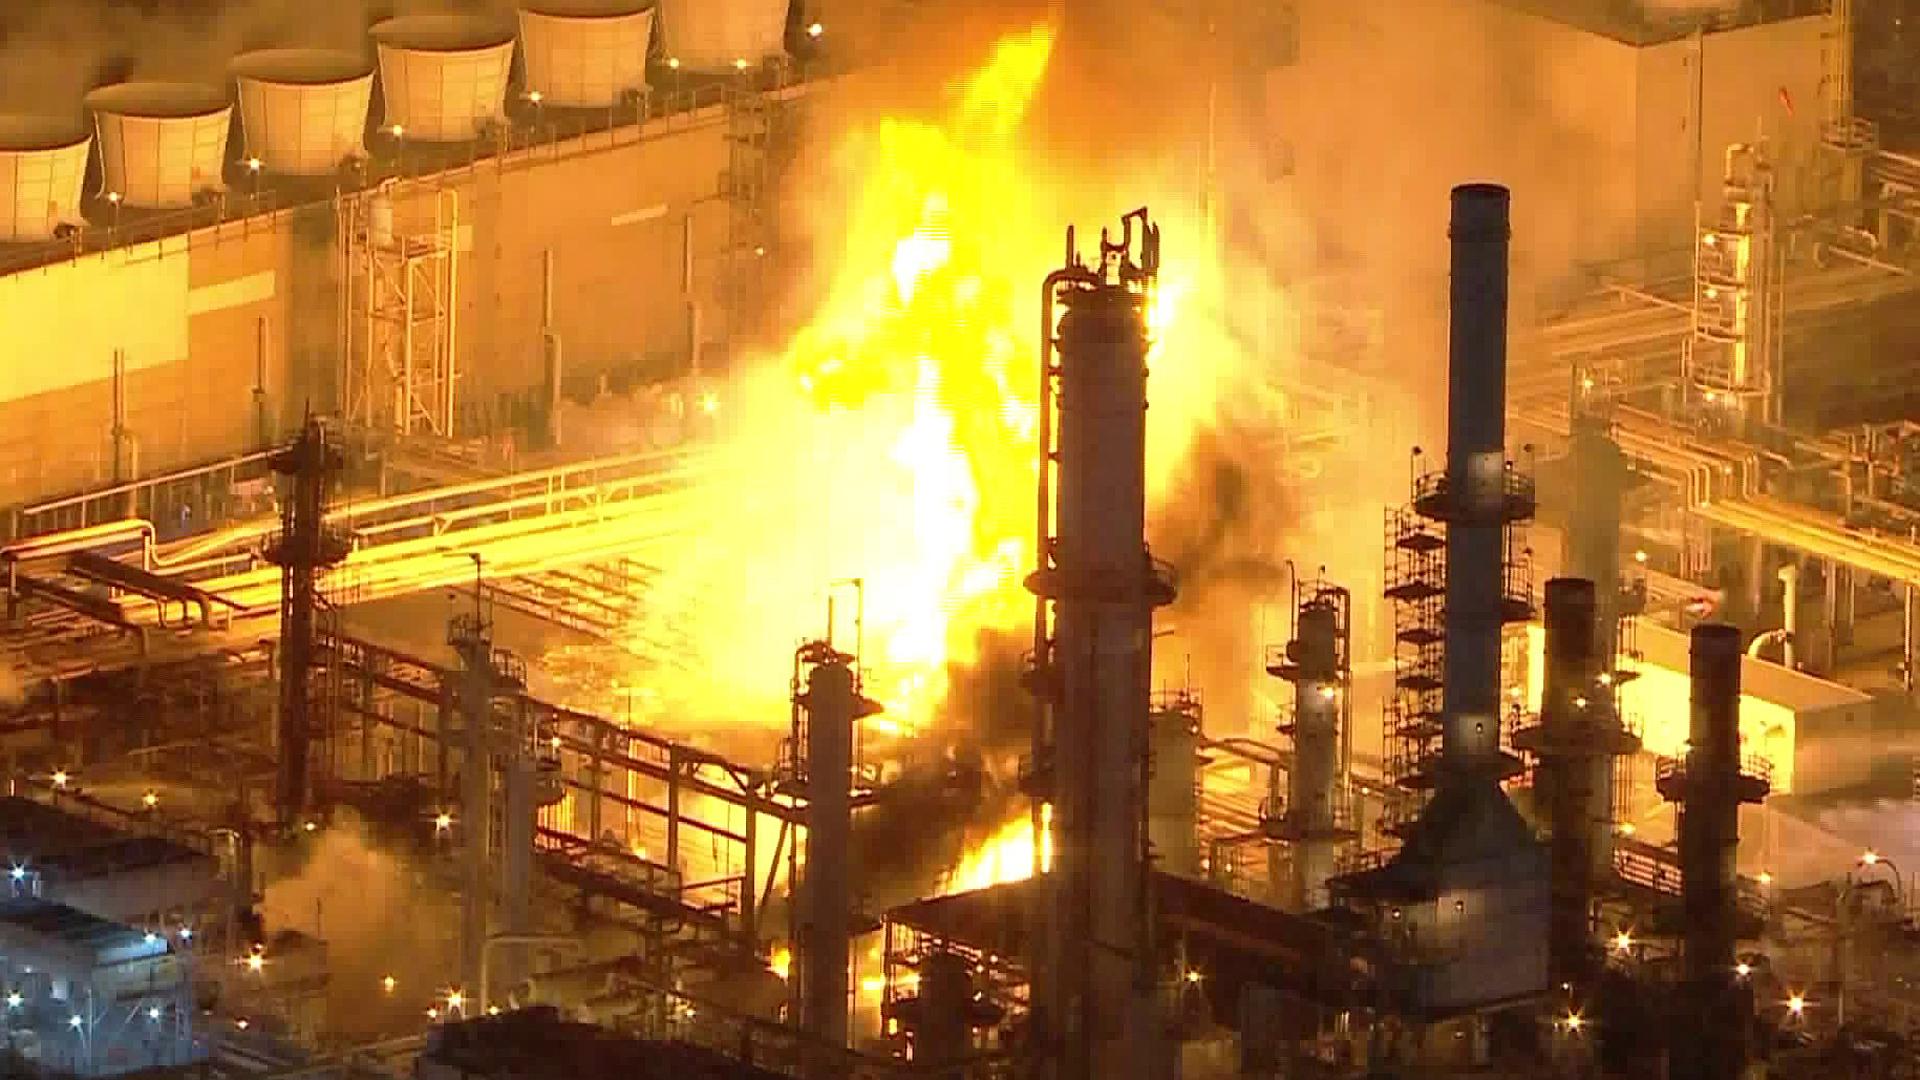 Marathon Petroleum Corporation refinery in Carson caught fire on Feb. 25, 2020. (KTLA)